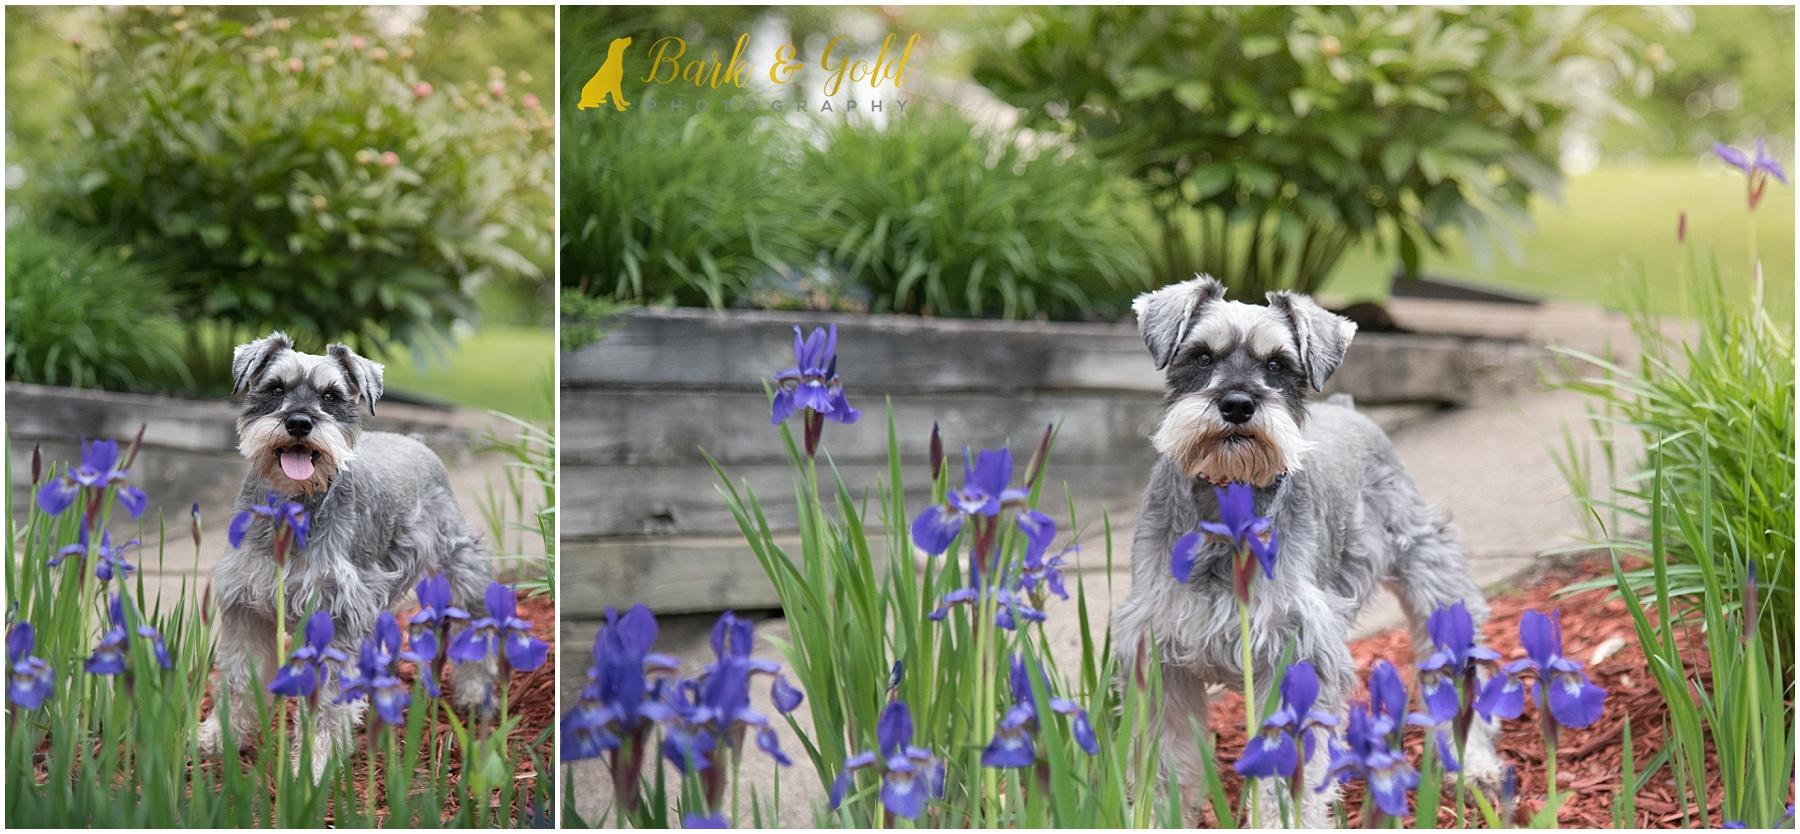 miniature schnauzer standing in purple iris garden